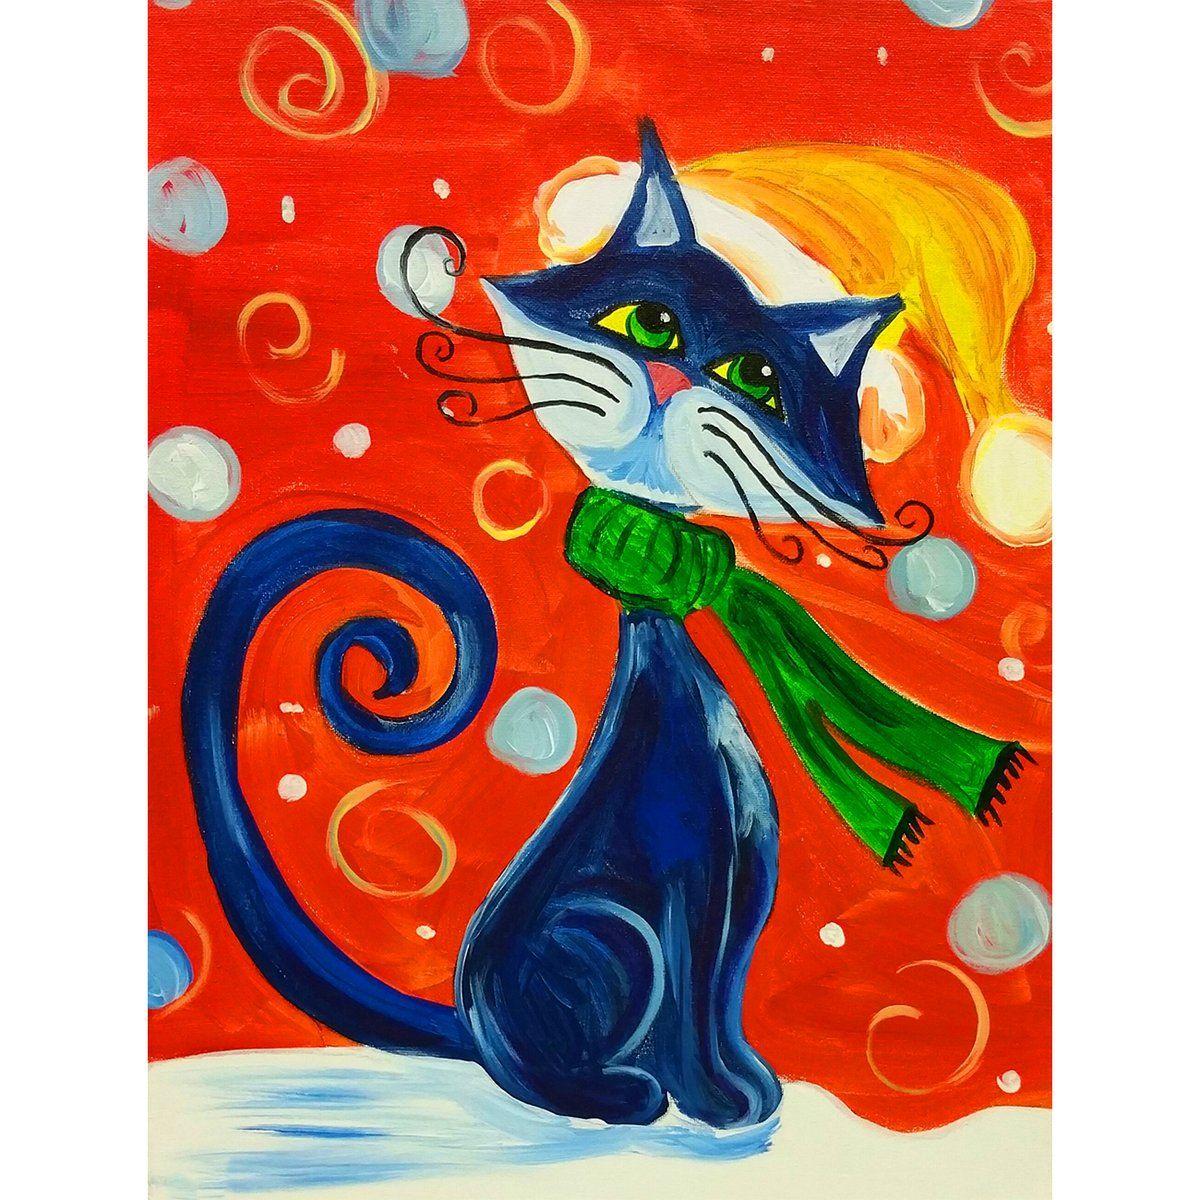 5d Diamond Painting Black Cat Paint With Diamonds Art Crystal Craft Decor Black Cat Painting Cat Painting Diamond Painting